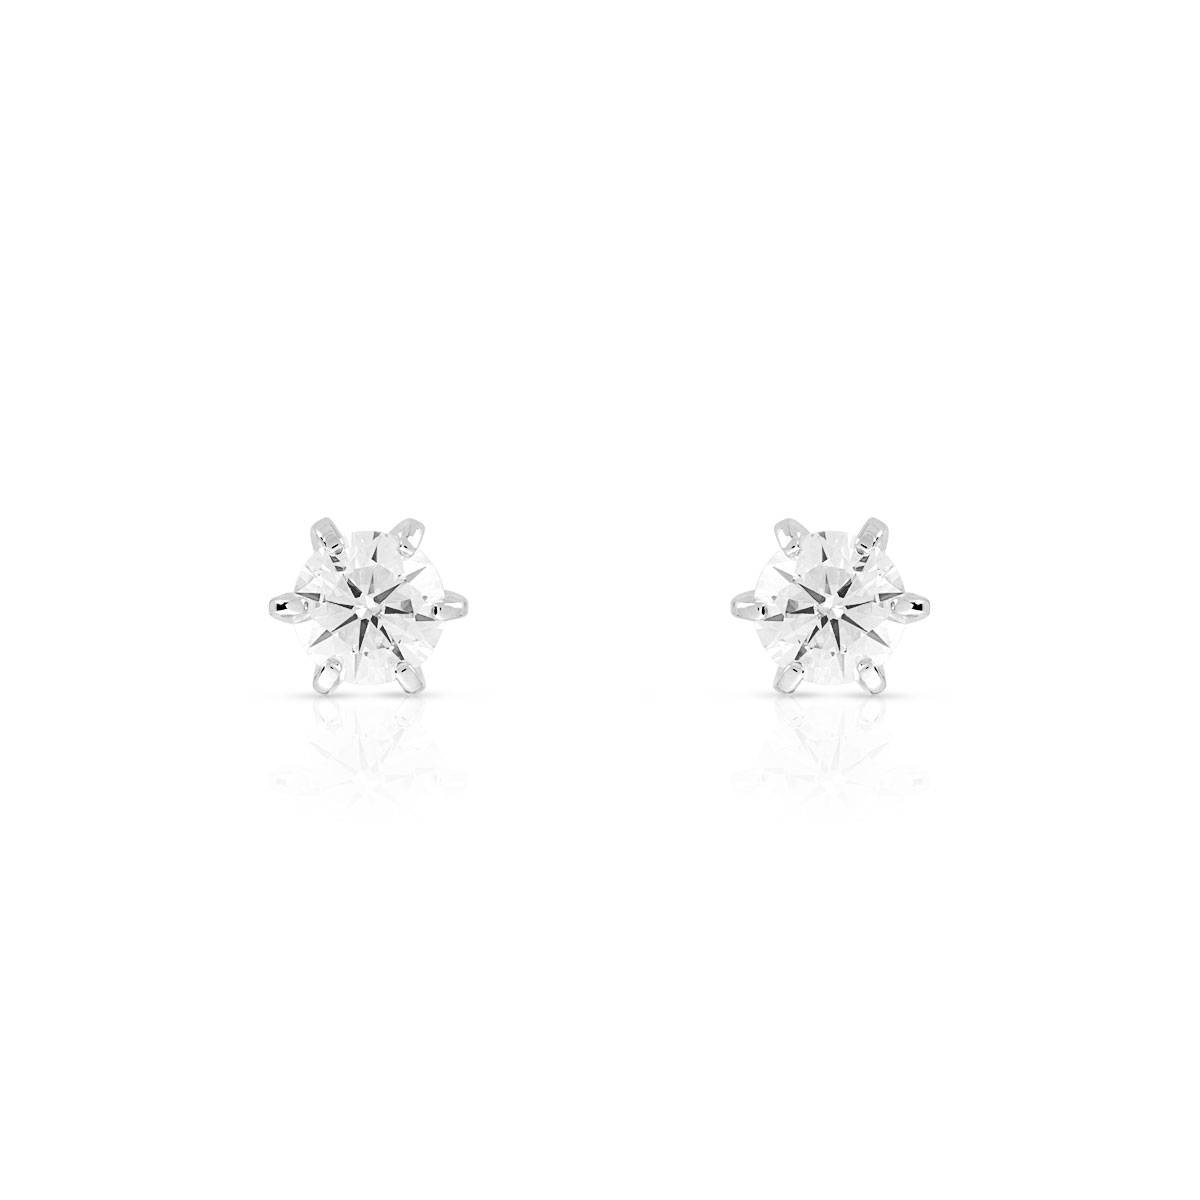 MATY Boucles d'oreilles or 750 blanc diamants synthétiques 0.40 carat- MATY